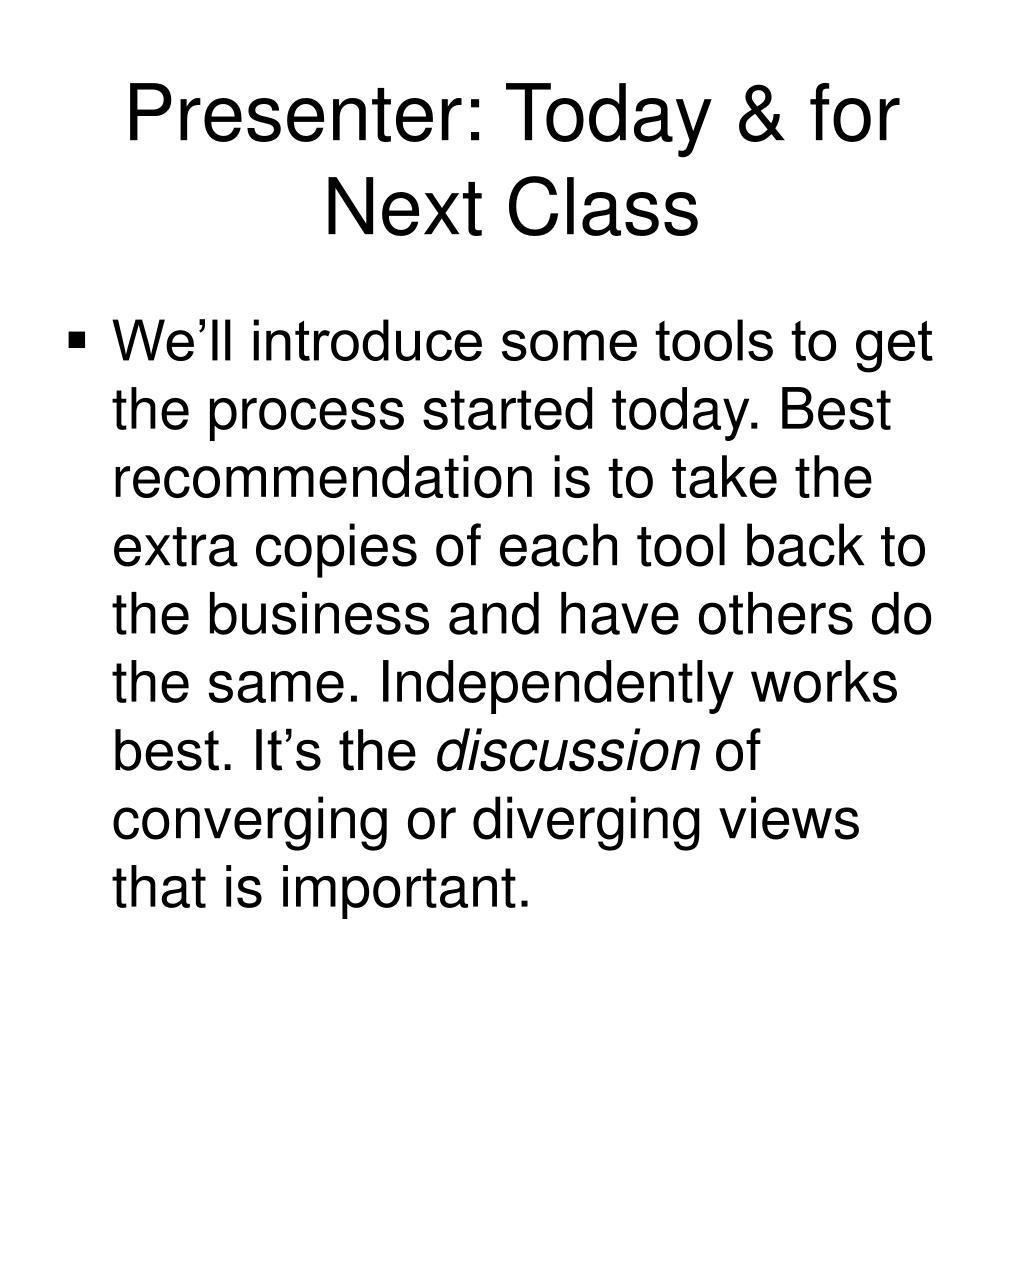 Presenter: Today & for Next Class